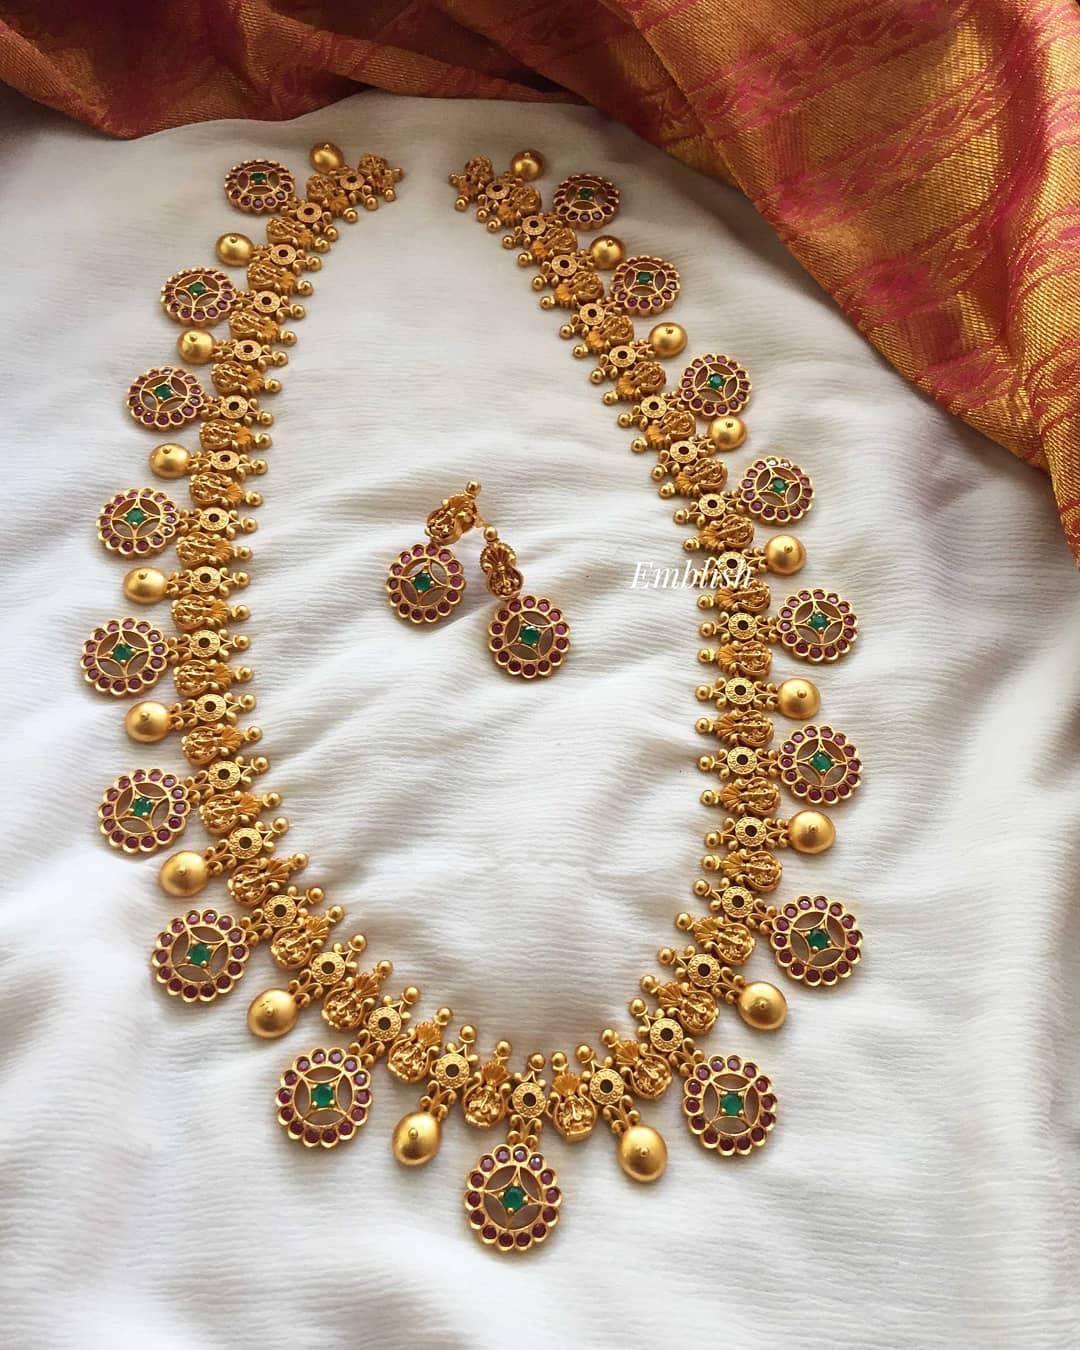 Matt-Finish-Imitation-Jewellery(6)